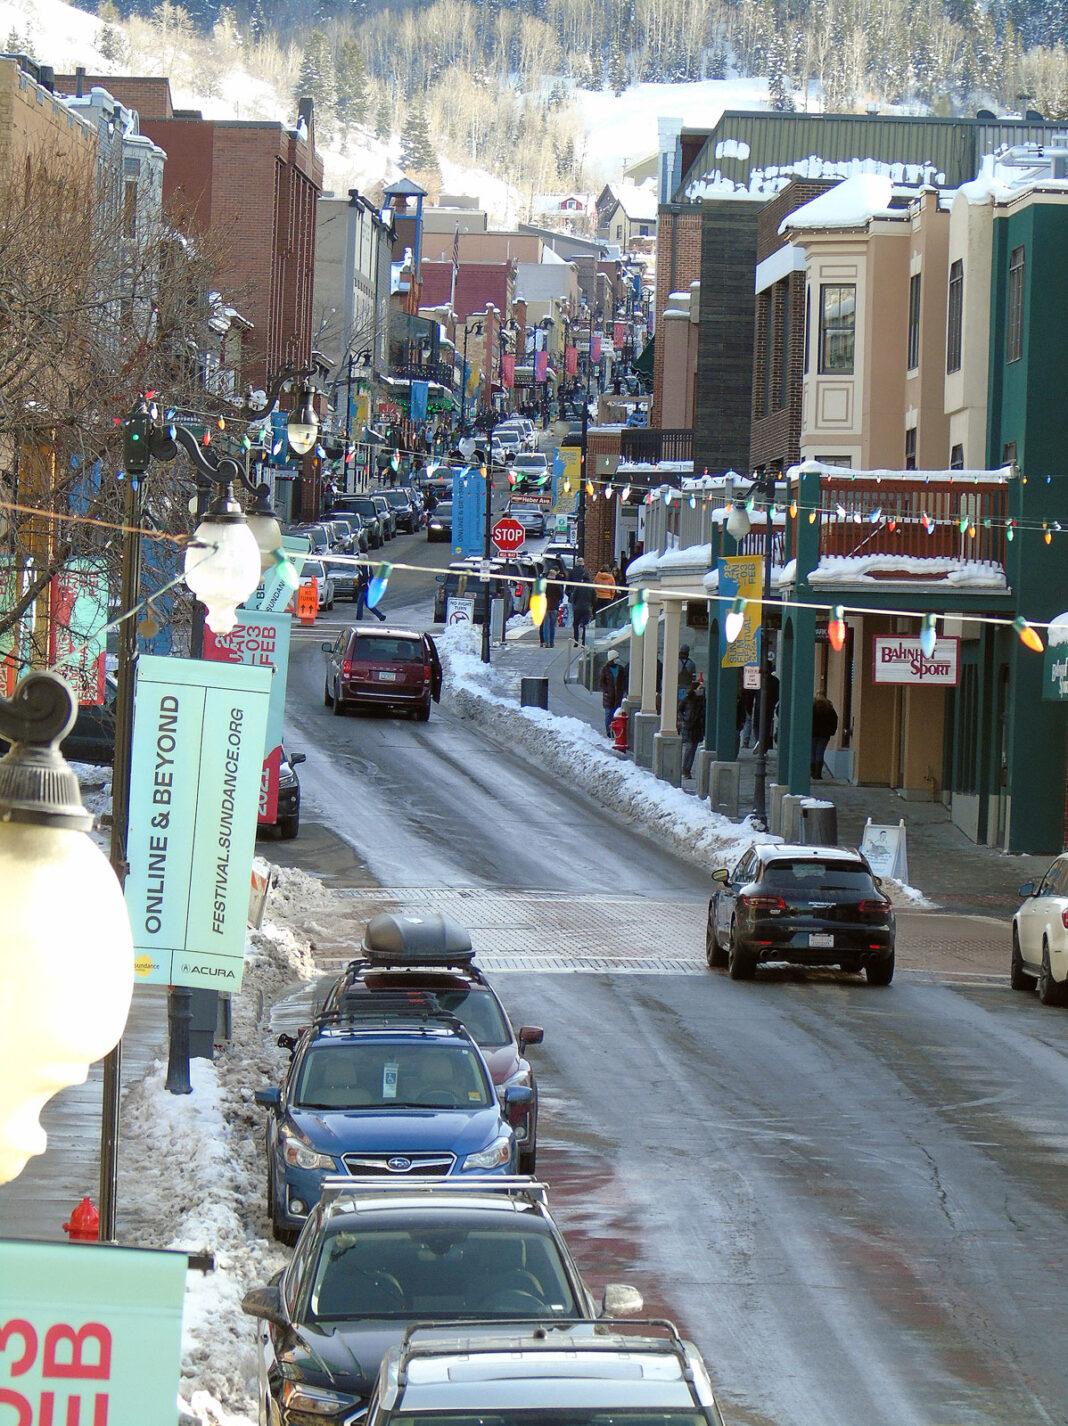 Vertical shot of Park City's Main Street